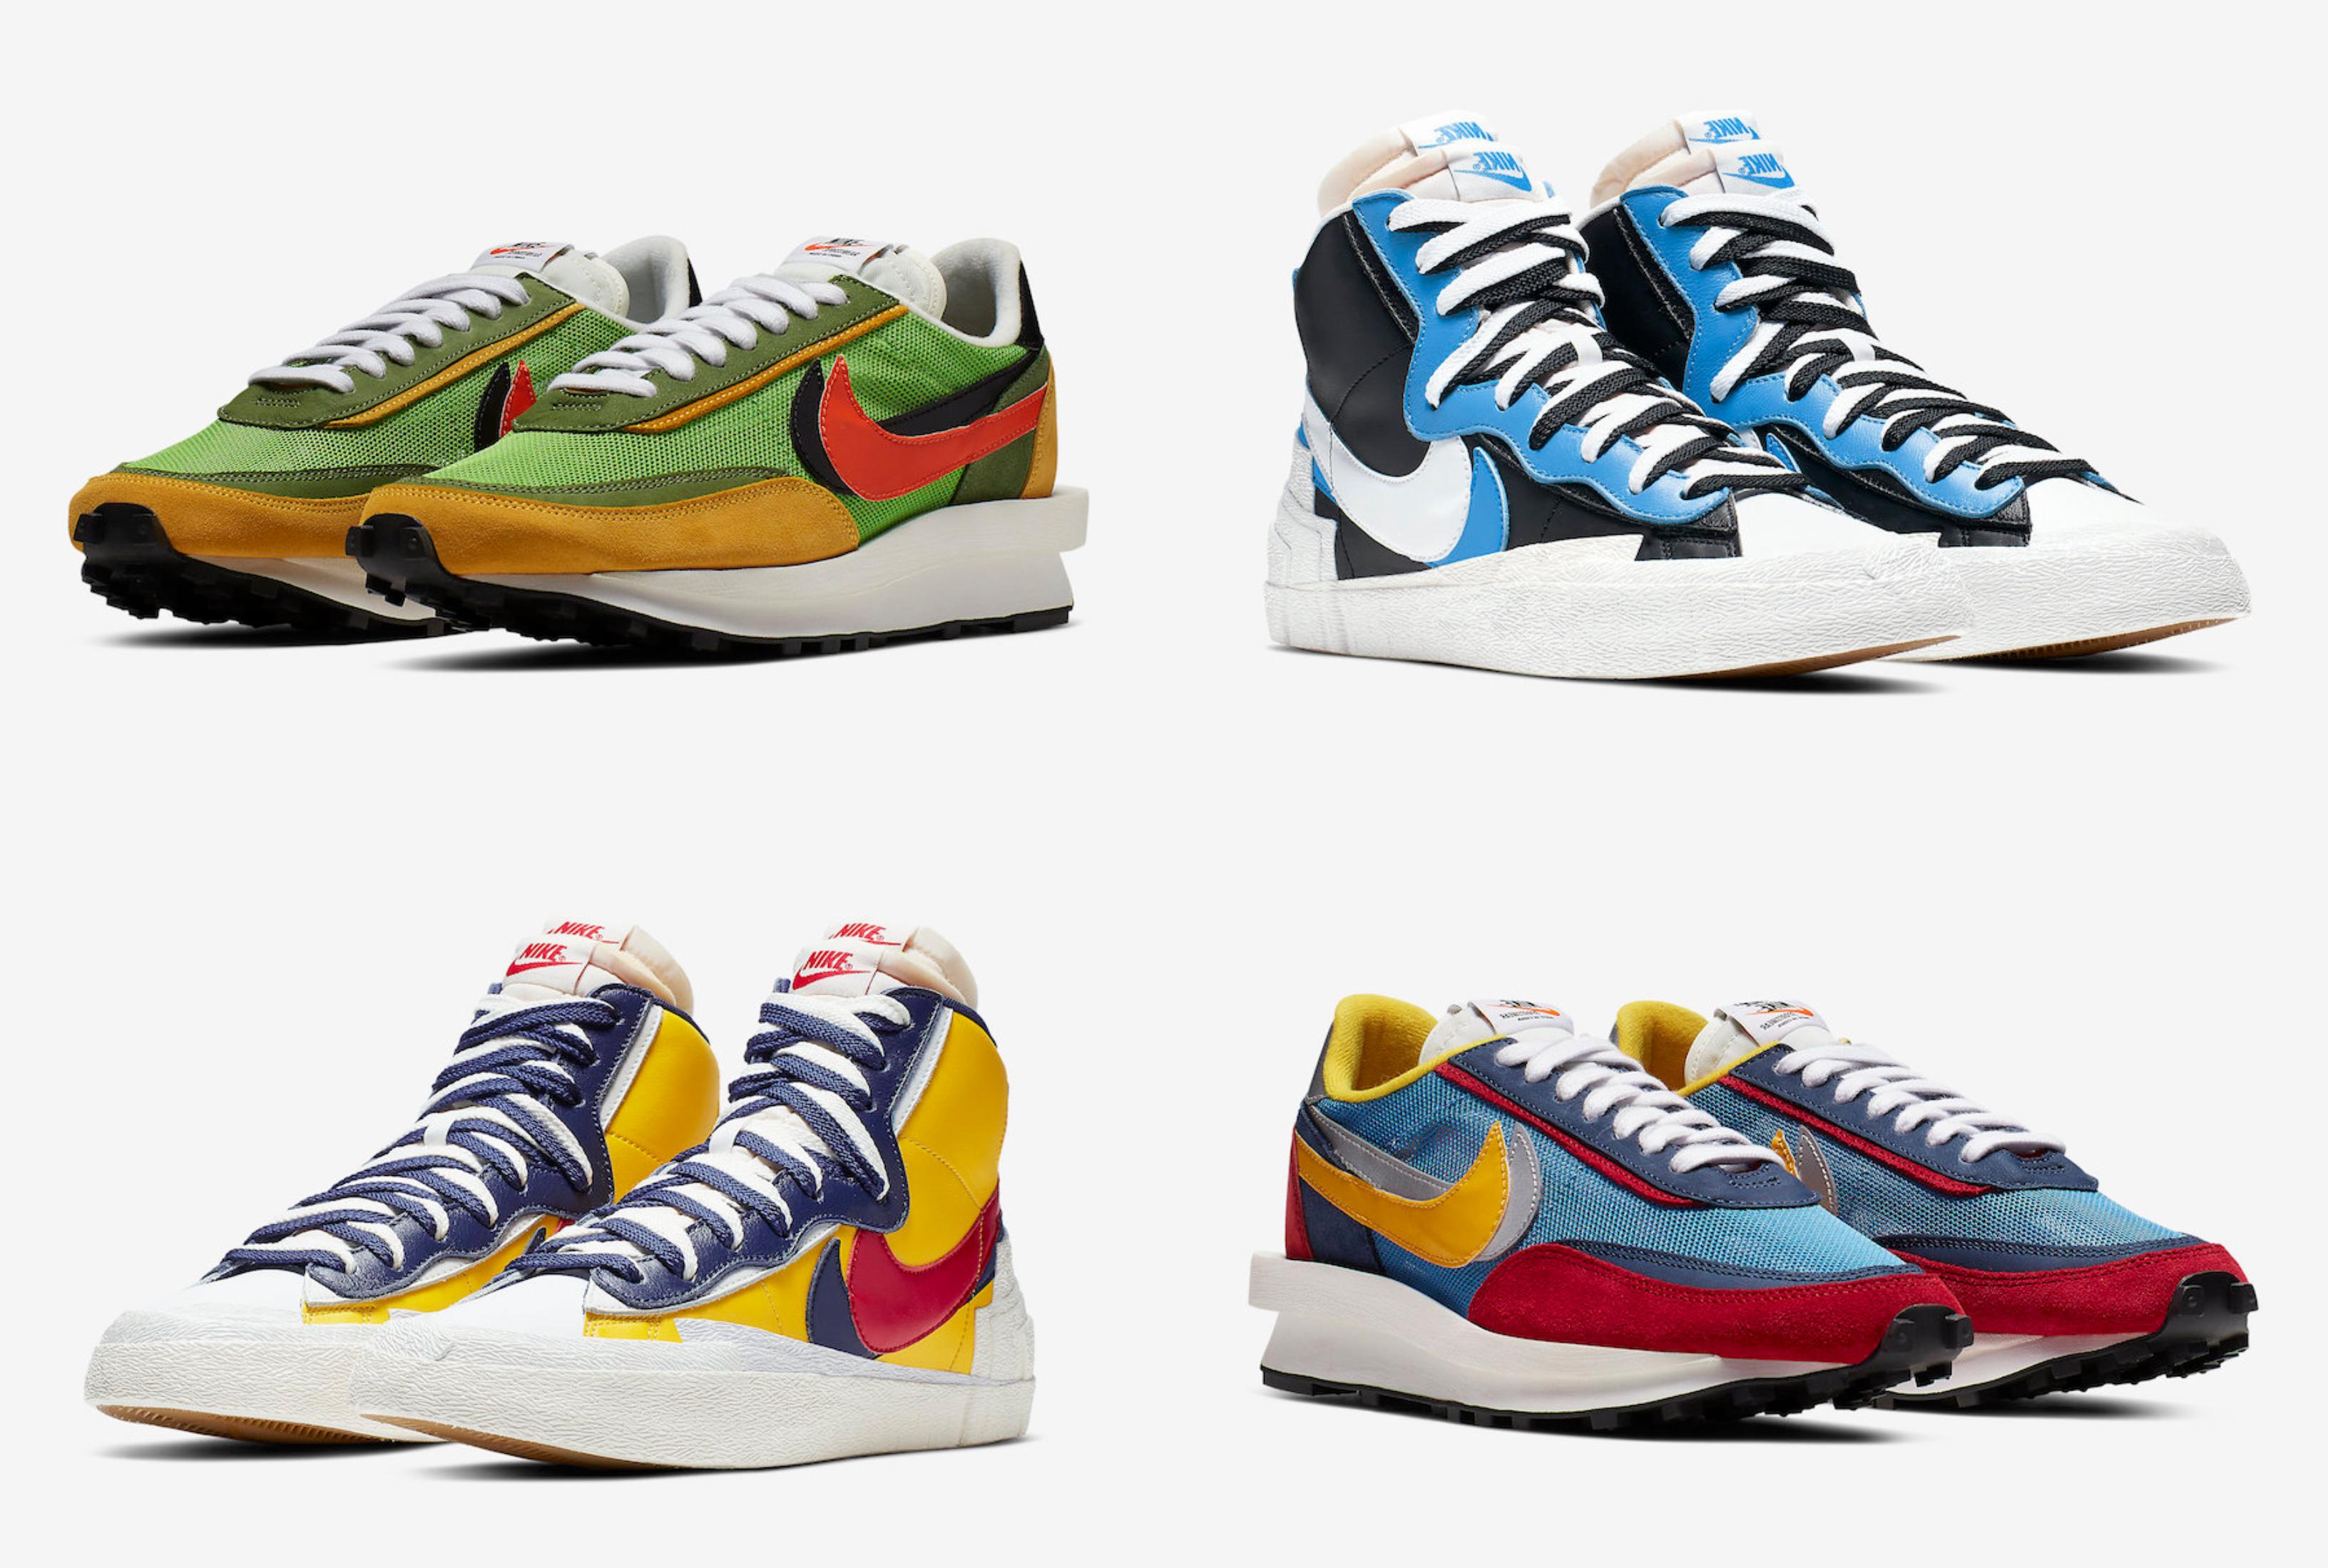 df832029e5f Where to Buy the Sacai x Nike LDWaffle and Blazer Mid - JustFreshKicks